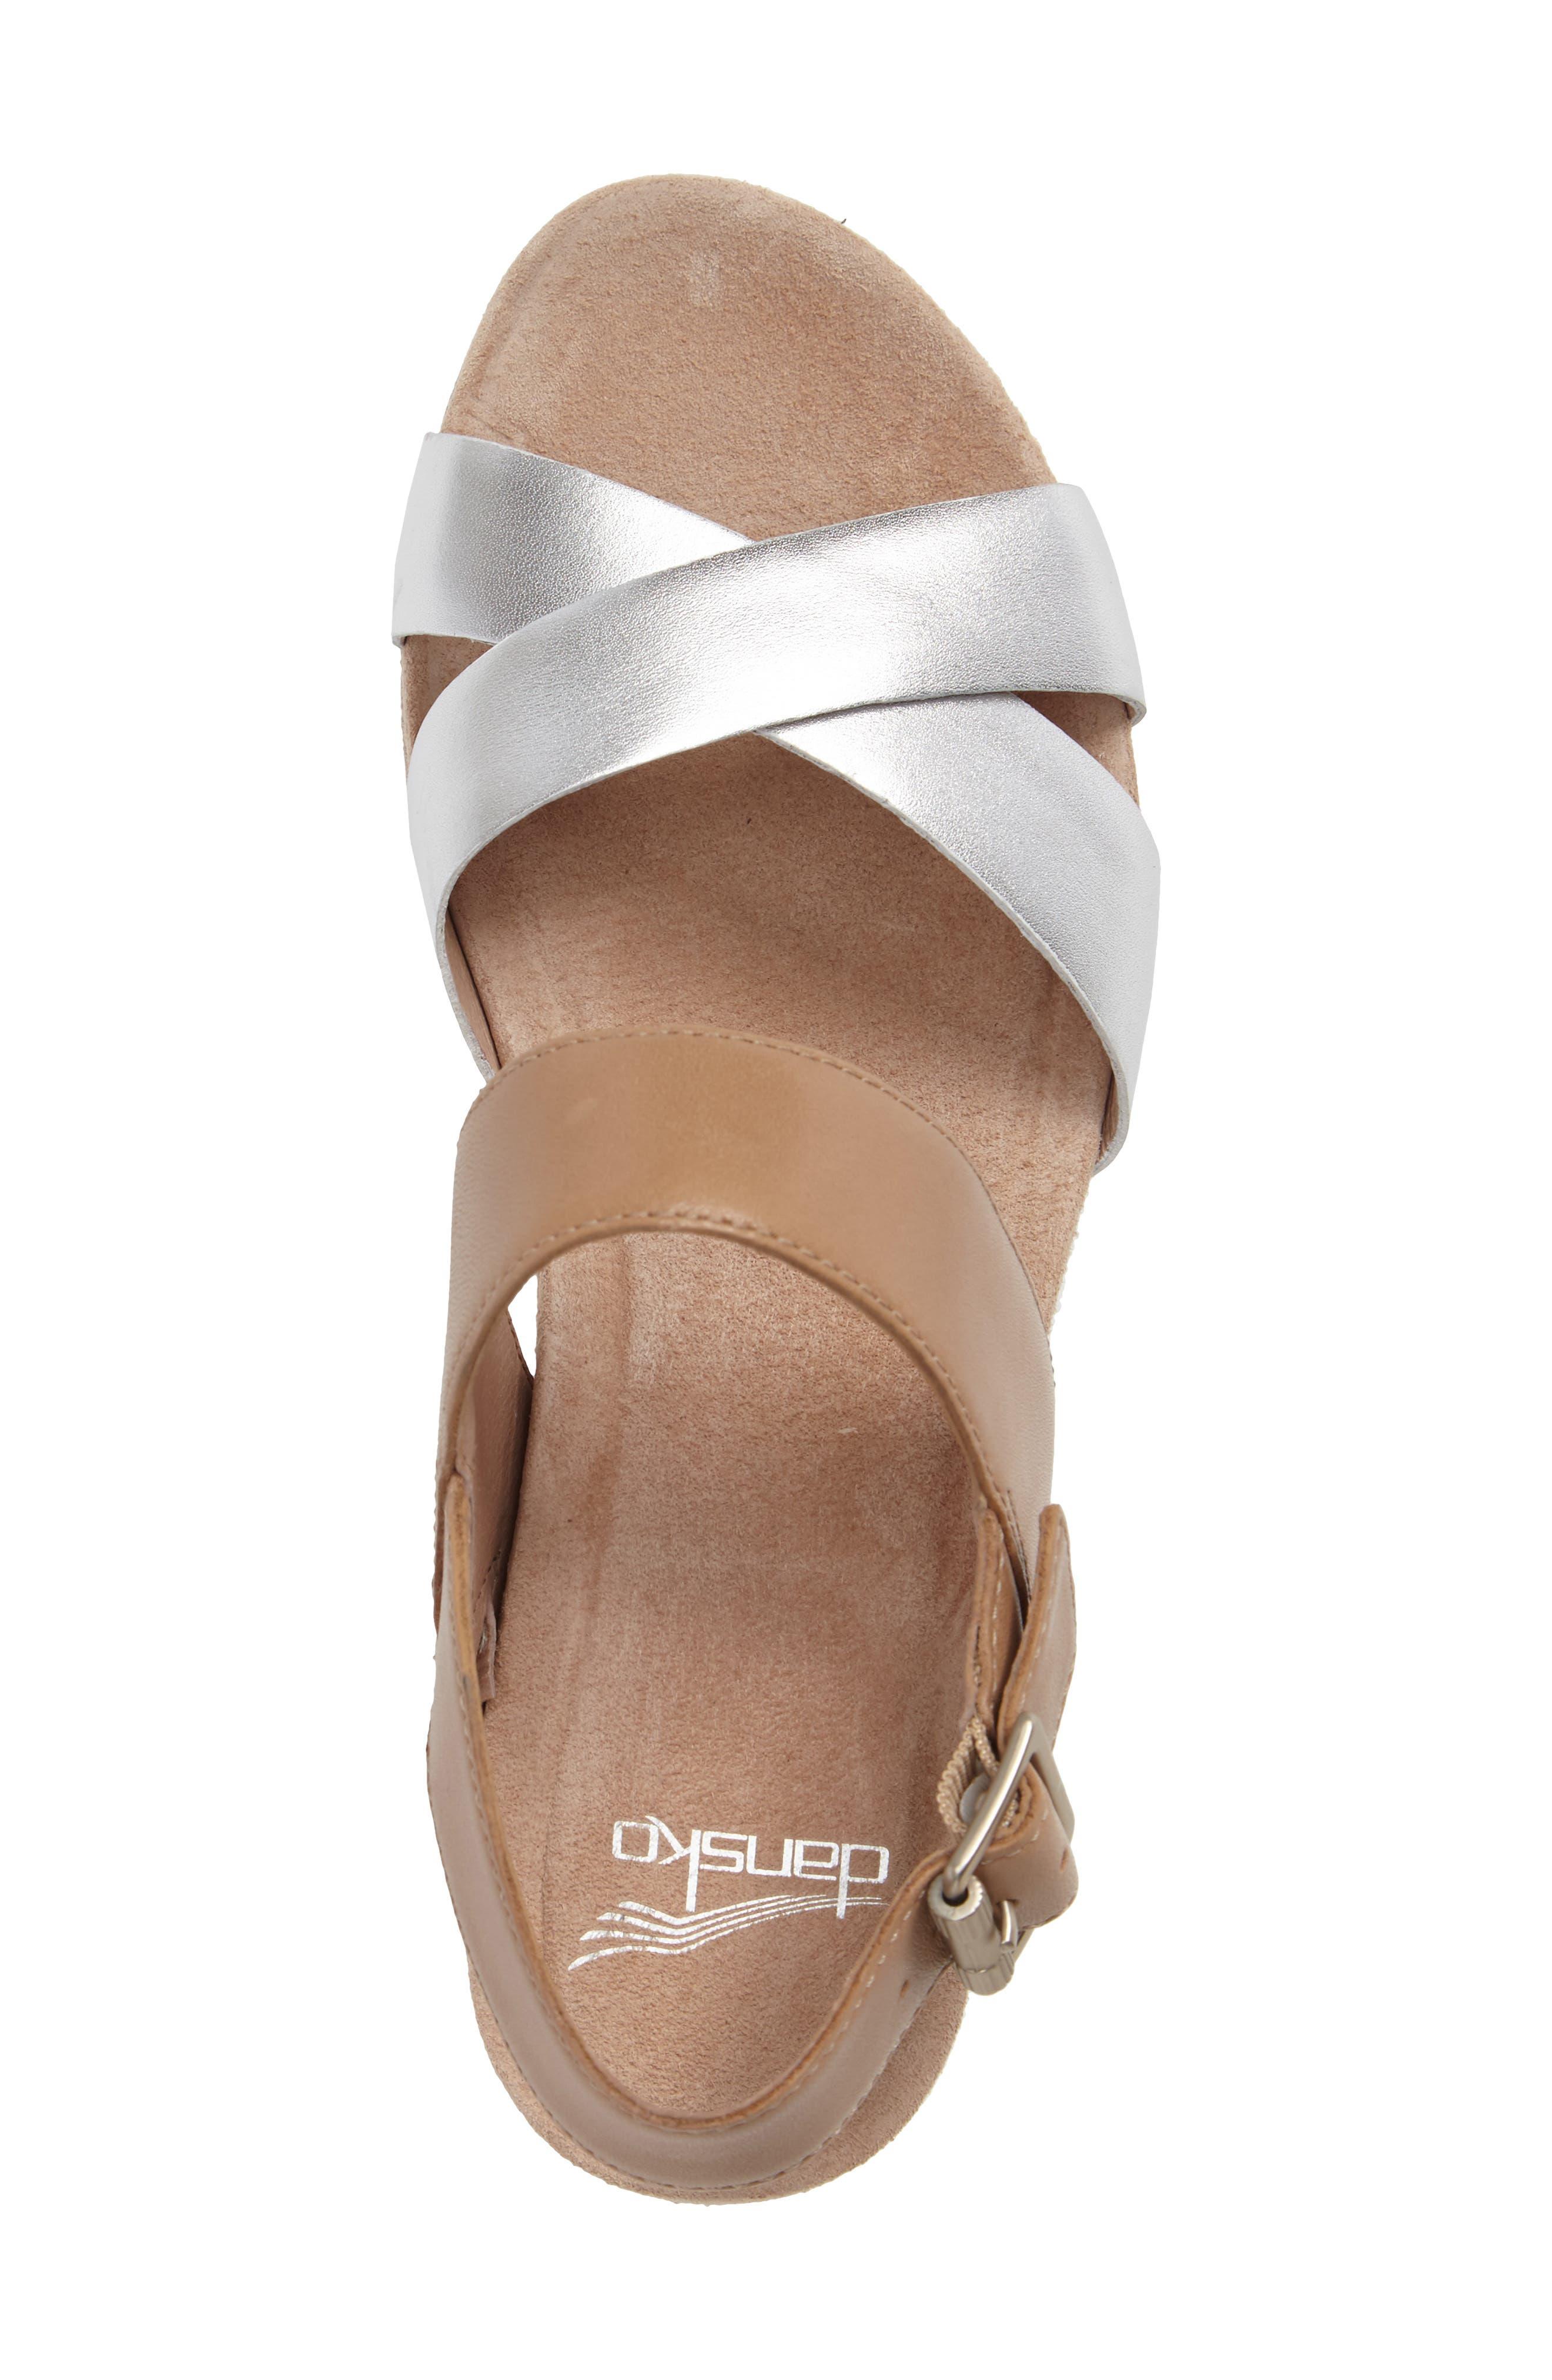 Stasia Platform Wedge Sandal,                             Alternate thumbnail 3, color,                             Sand/ Silver Leather